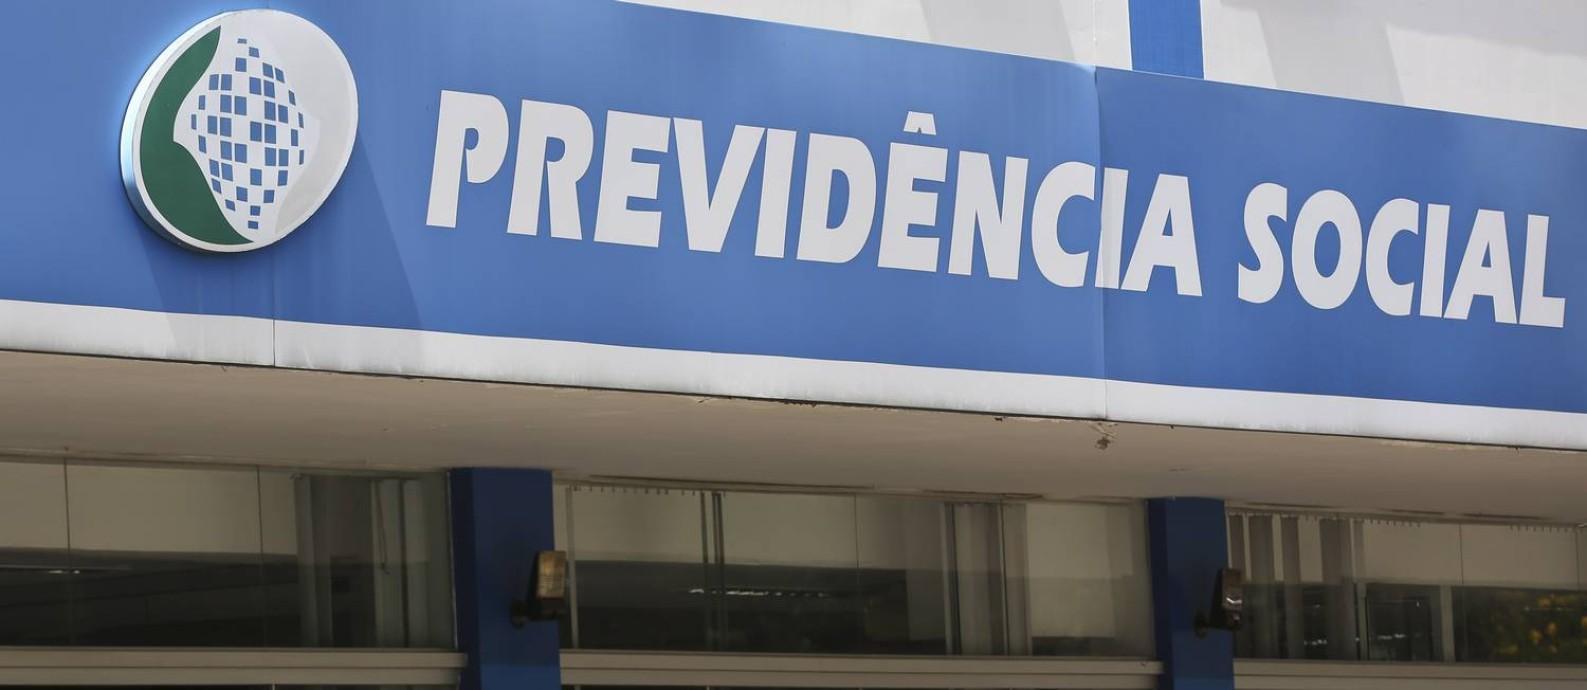 Agência da Previdência na Asa Sul, em Brasília. Foto Michel Filho/Agência O Globo Foto: /